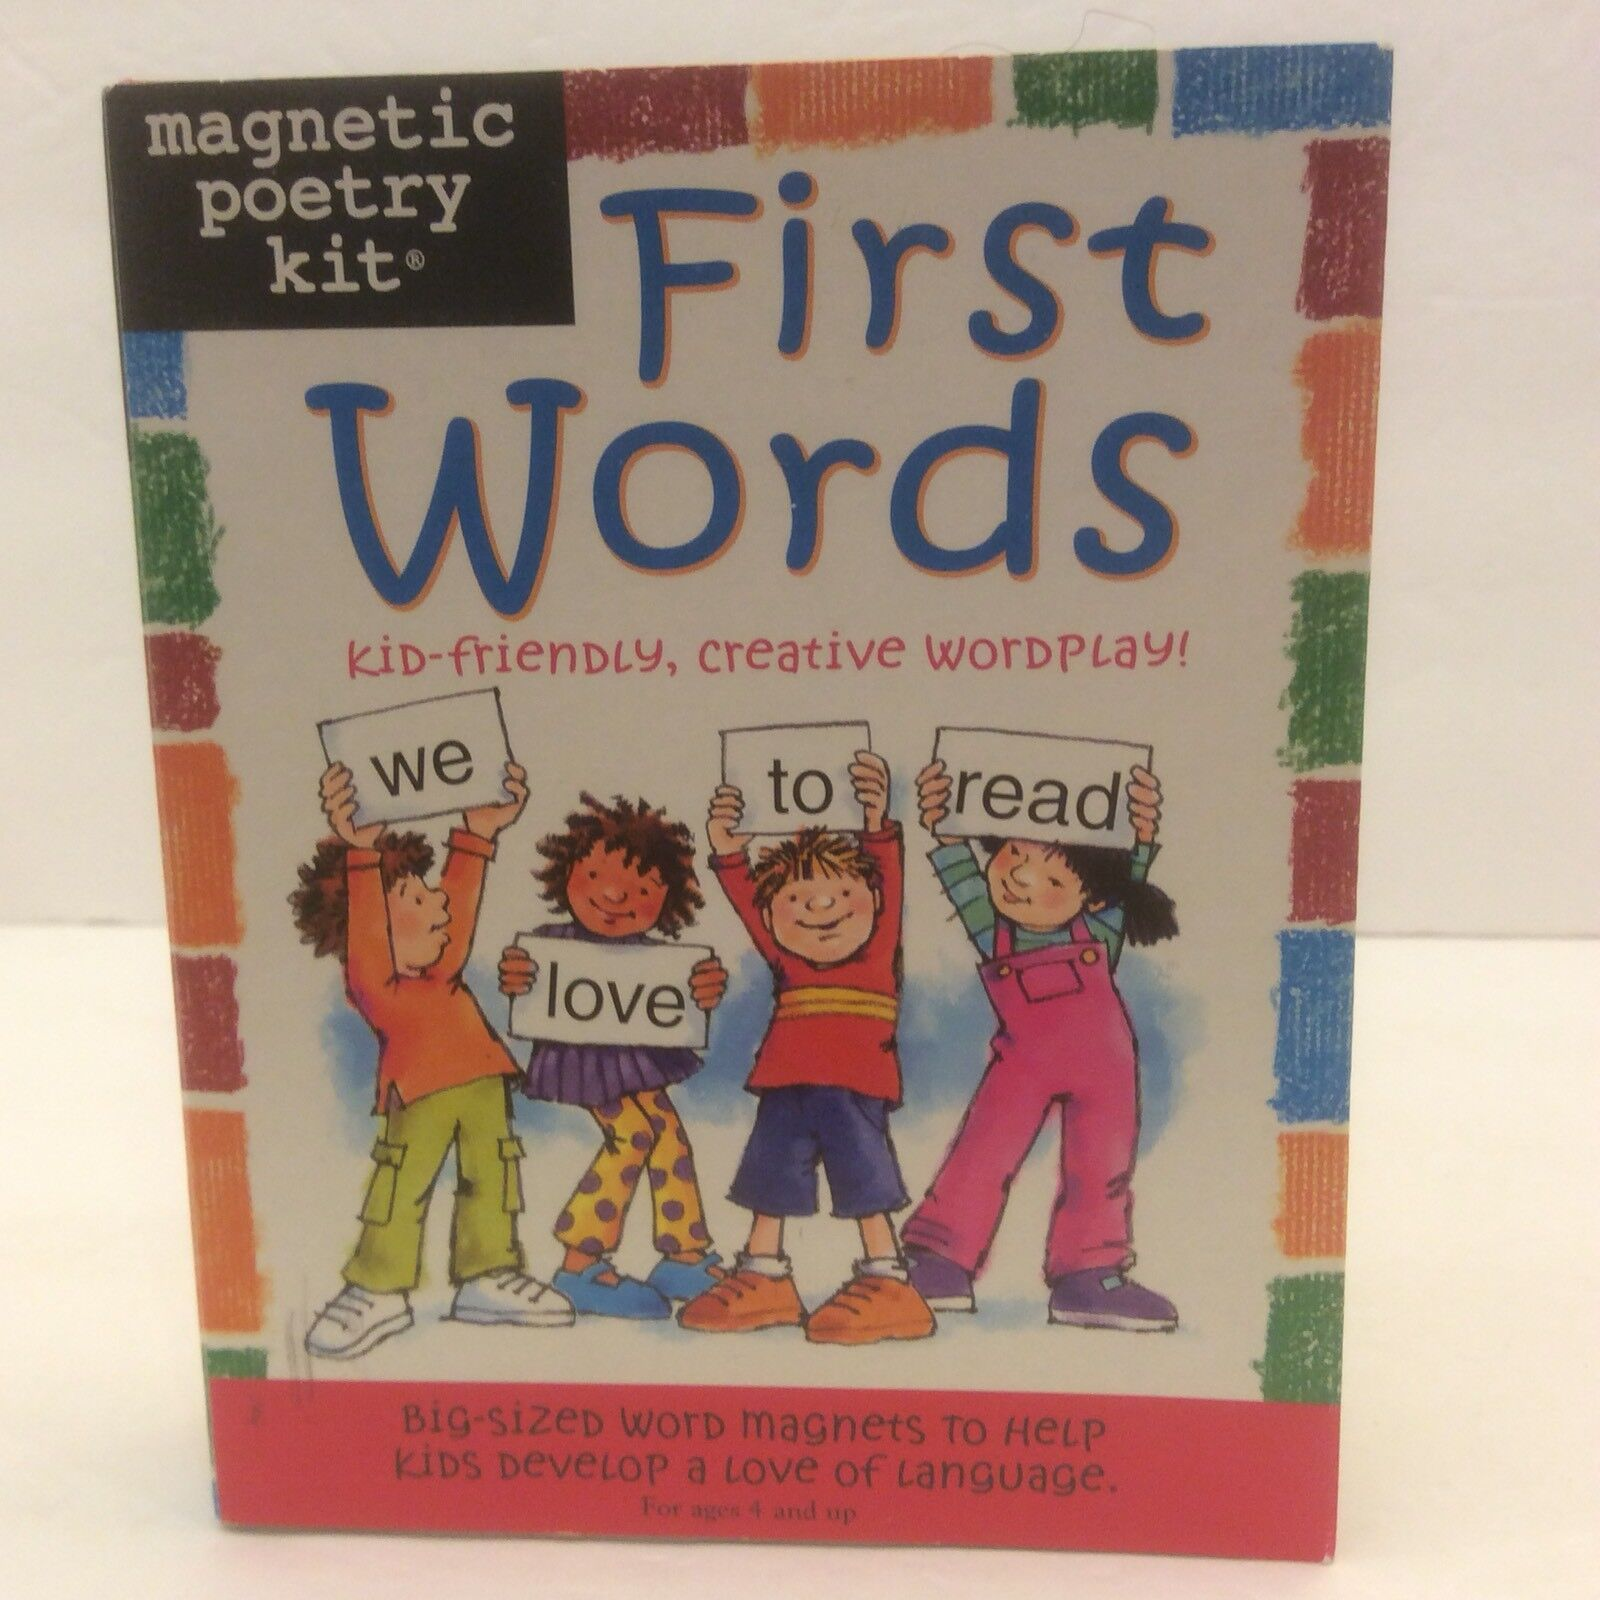 Magnetic Poetry Kids First Words Kit Homeschool Educate Language